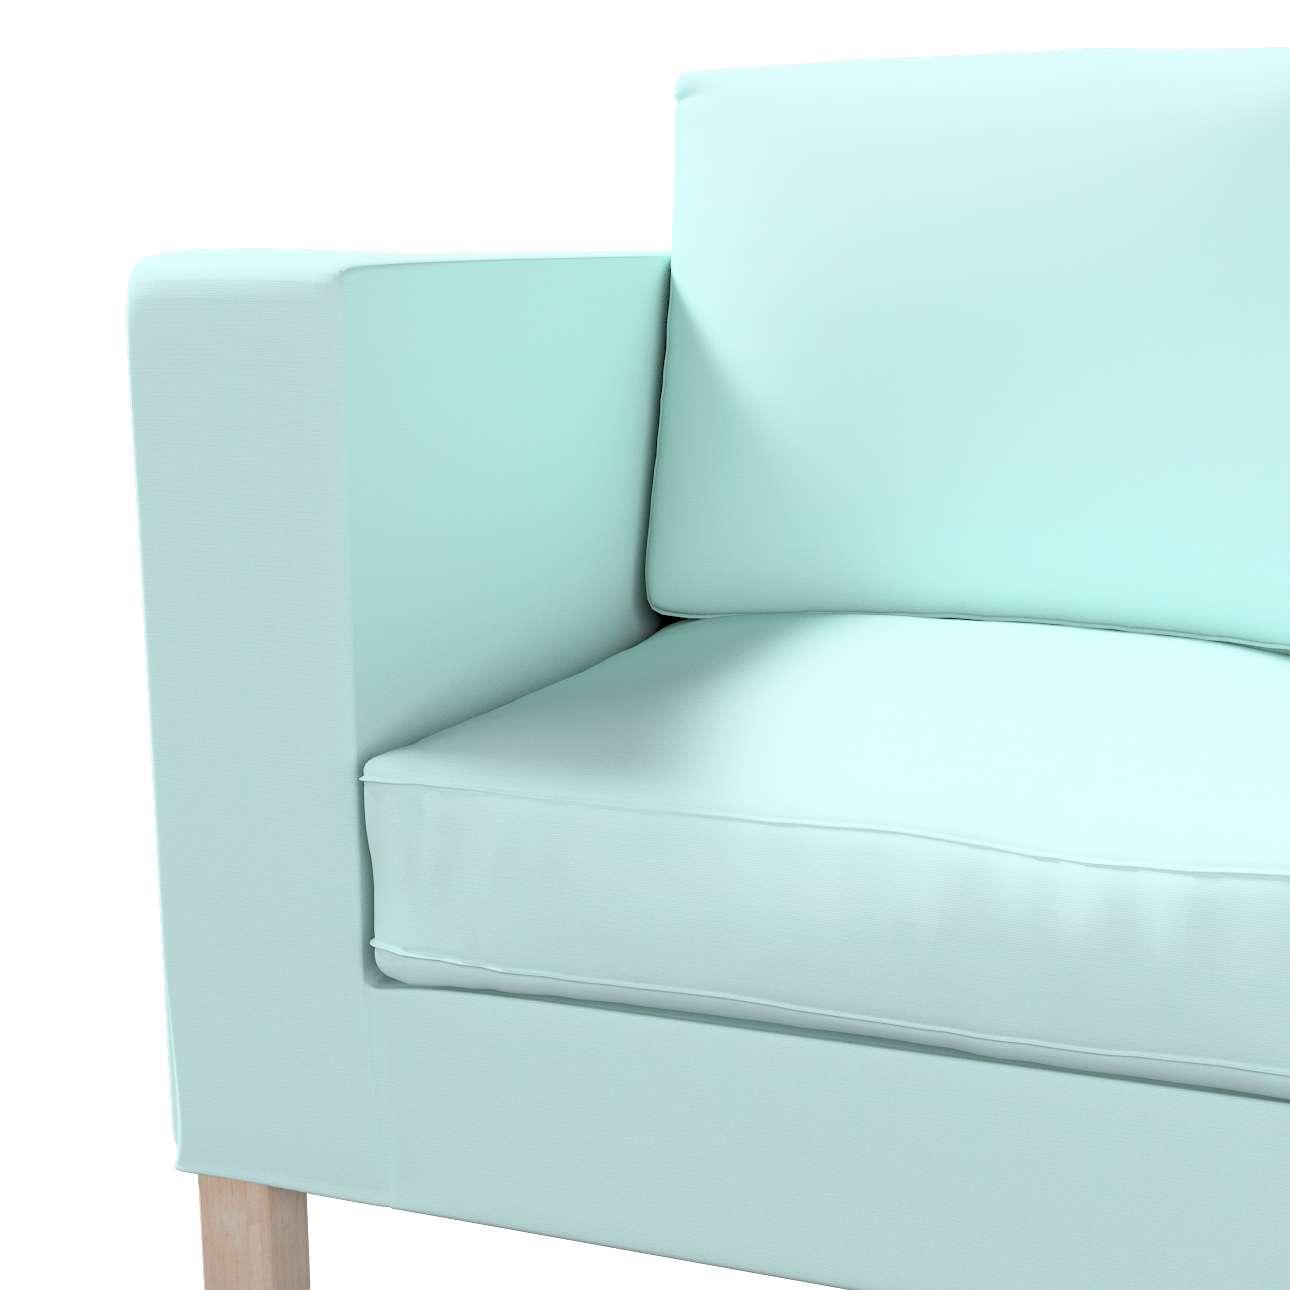 Karlanda klädsel<br>2-sits soffa - kort klädsel i kollektionen Panama Cotton, Tyg: 702-10